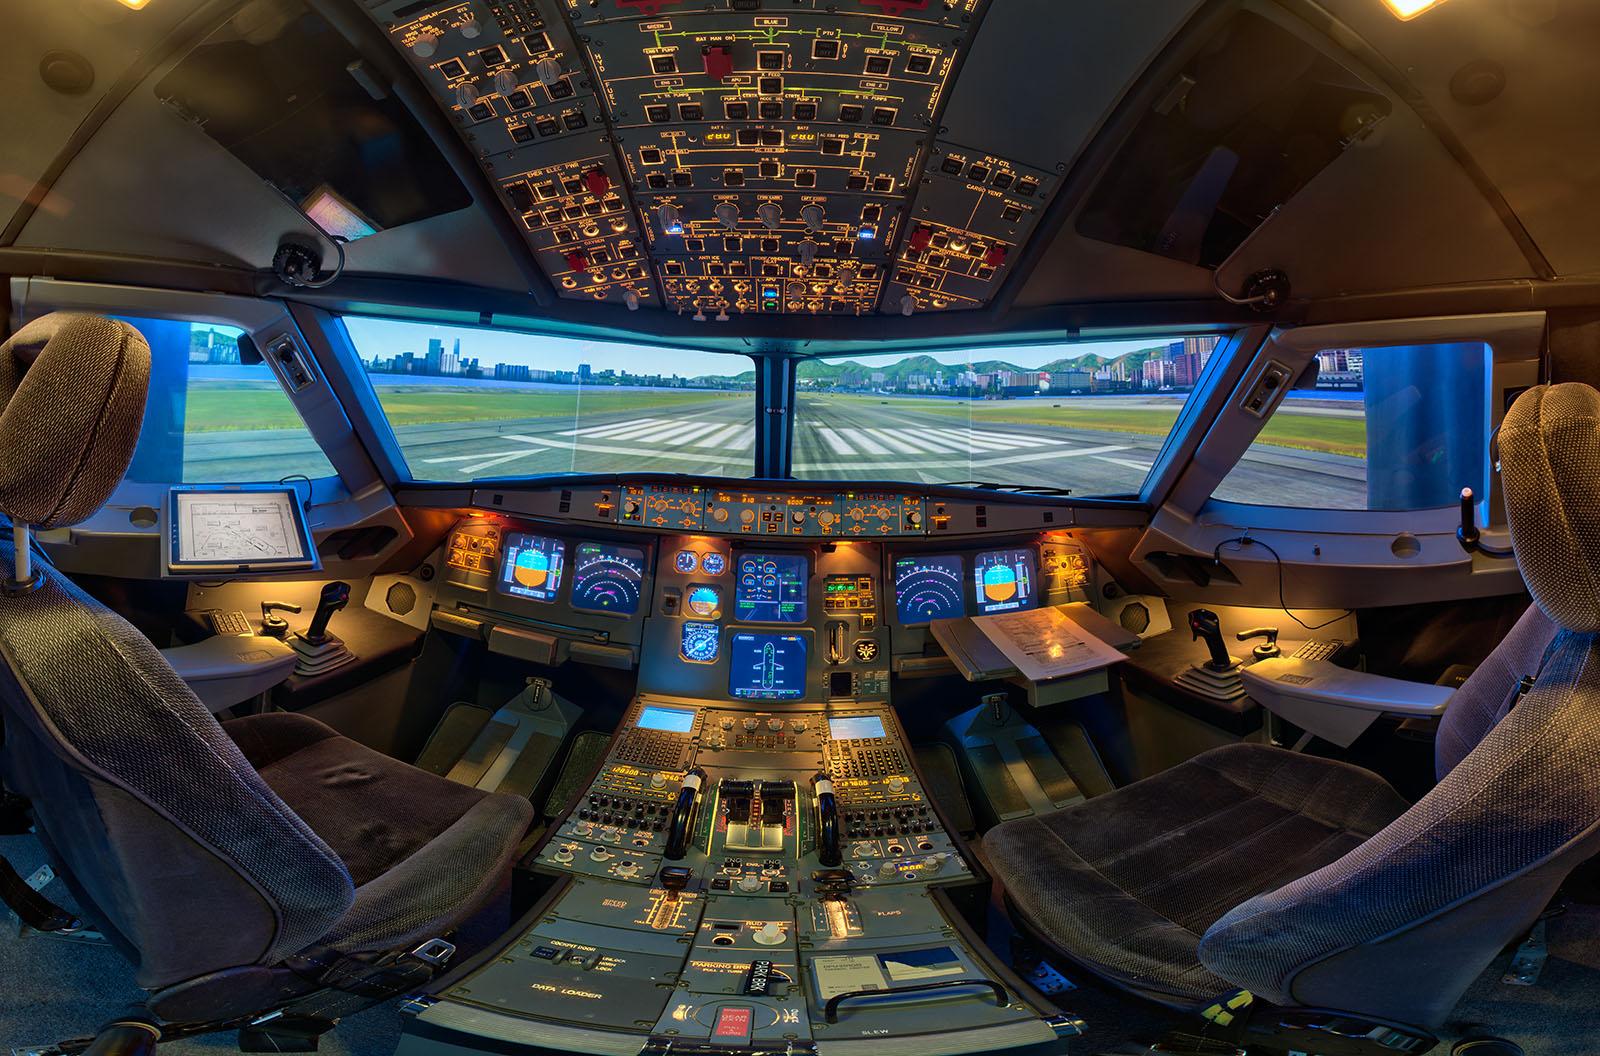 Homecockpit A320 (Sachsen) | Flugsimulator-Vergleich